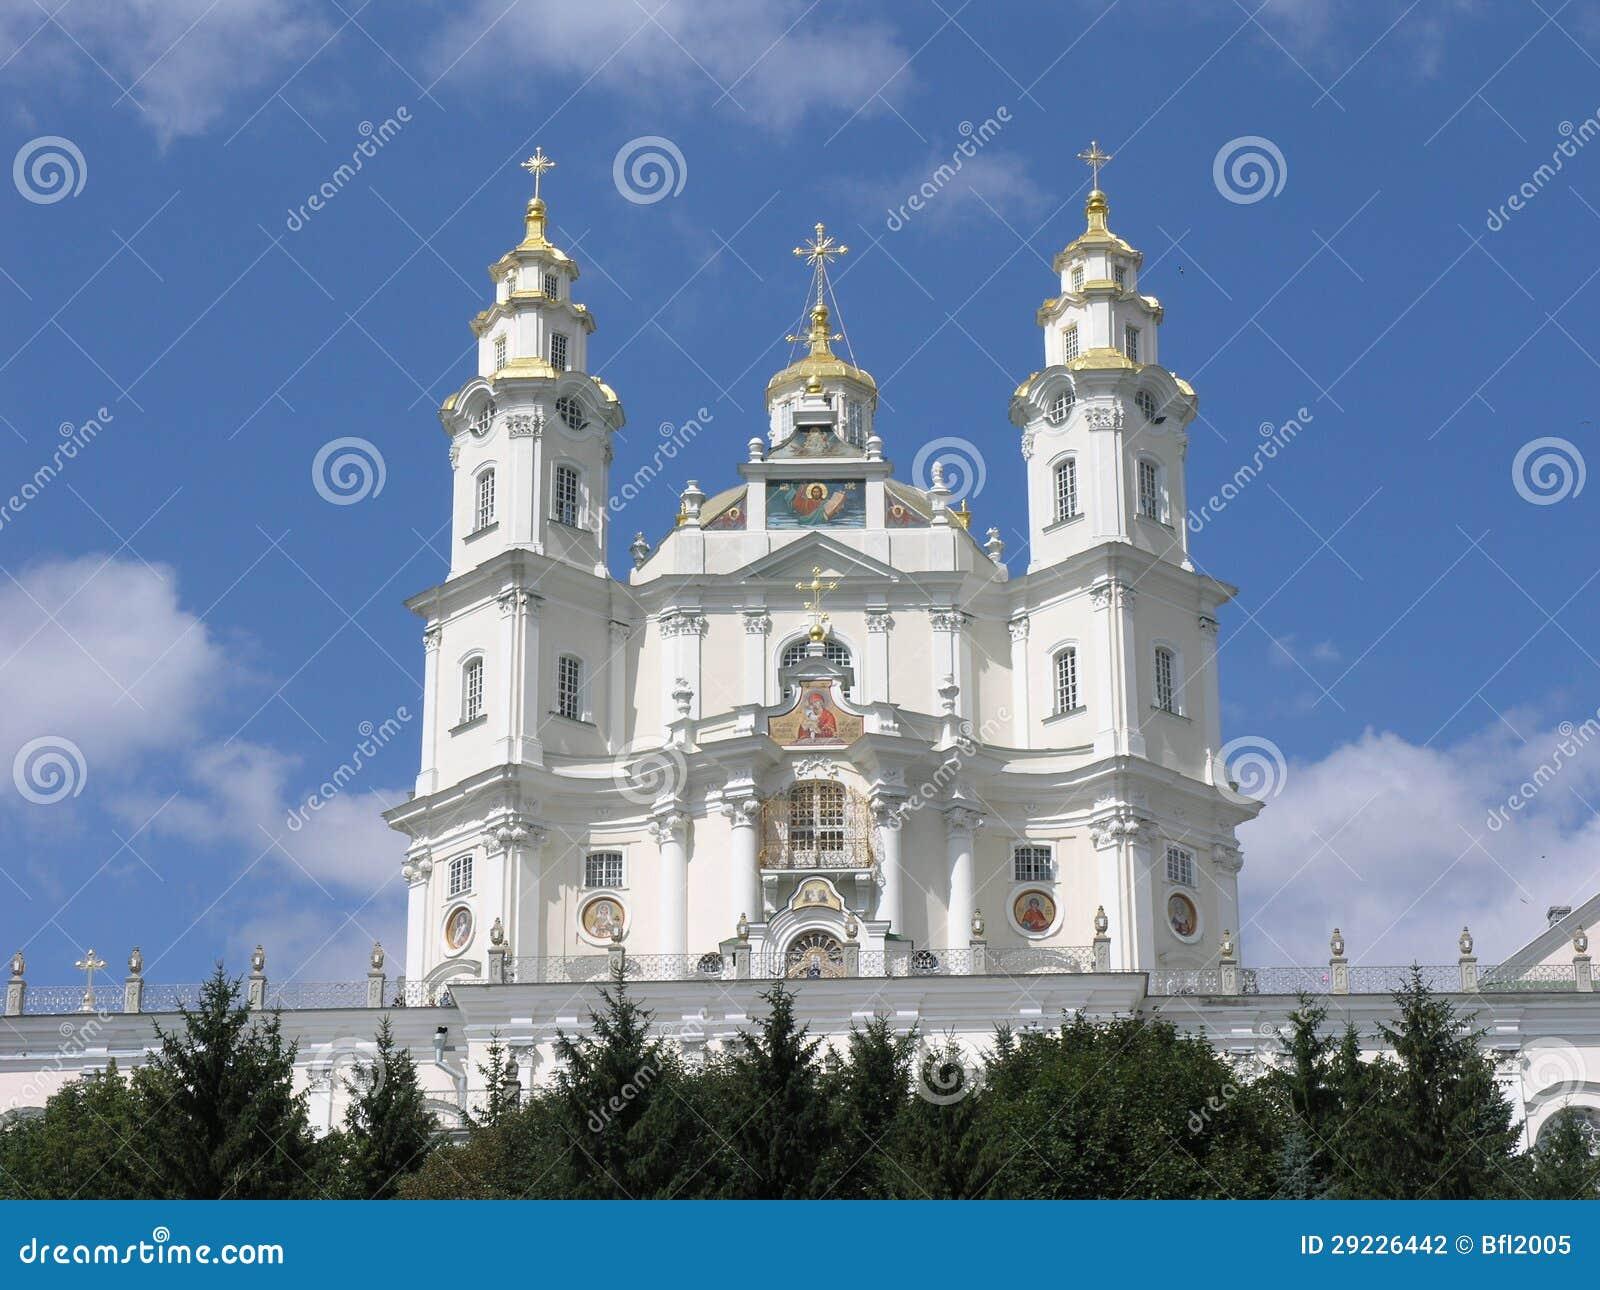 Download Pochaiv Lavra foto de stock. Imagem de christianity, europa - 29226442